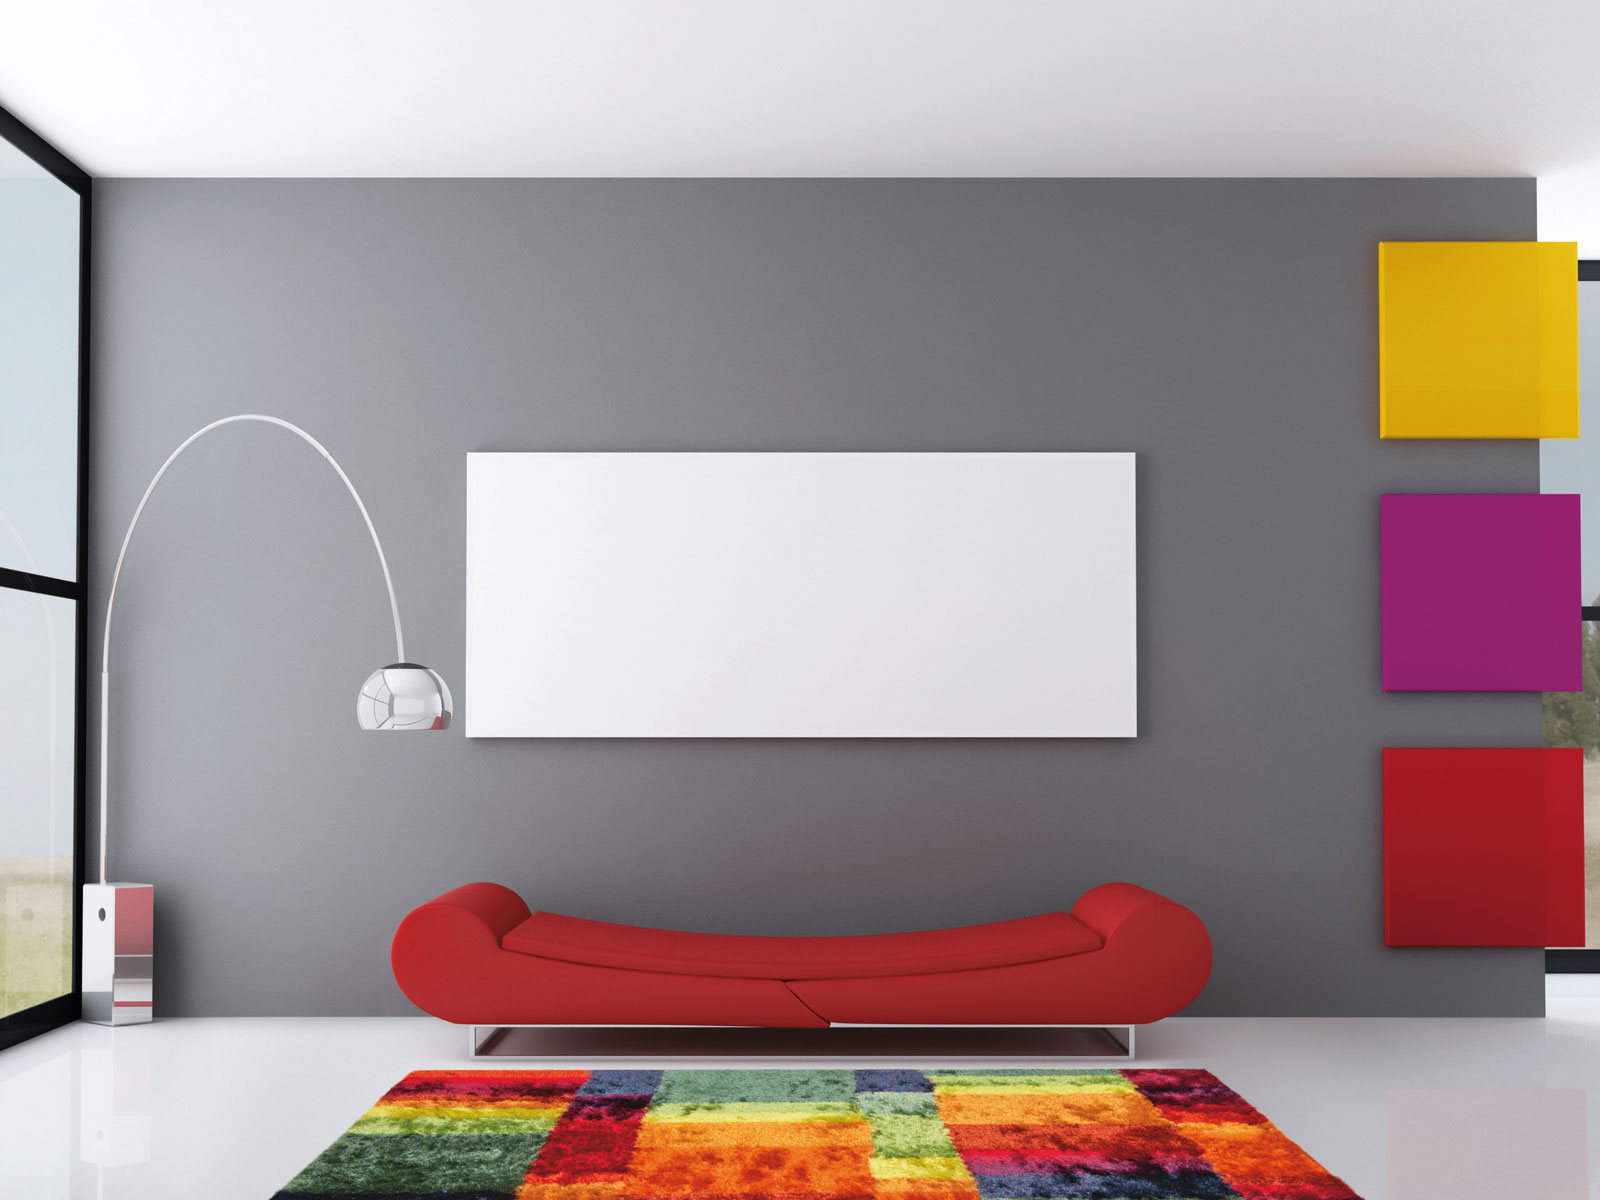 T raum und design beratung f r raumgestaltung aus aue for Raumgestaltung und design